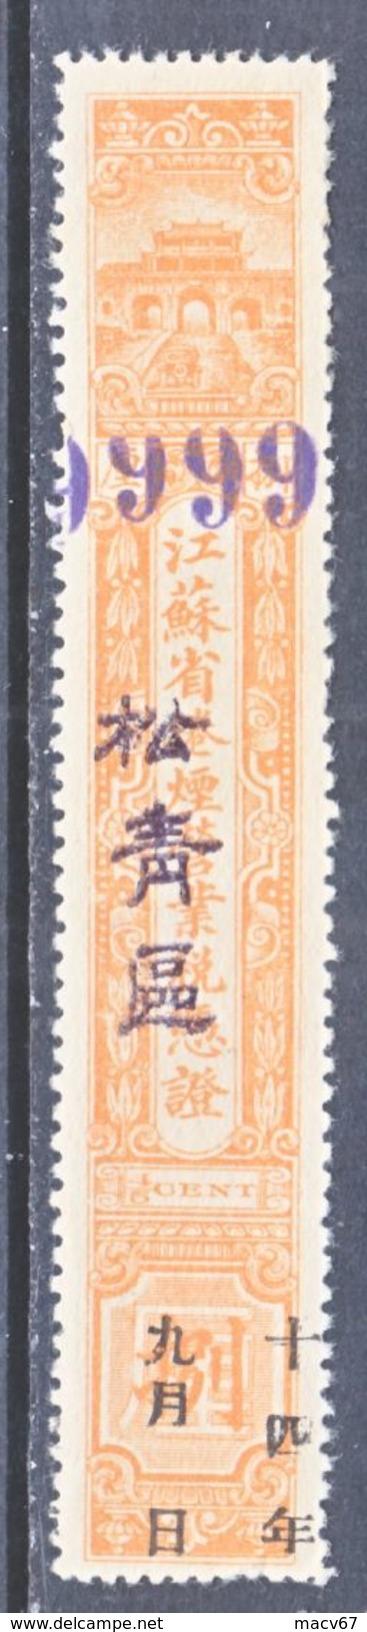 OLD  CHINA  REVENUE  2   ** - 1912-1949 Republic